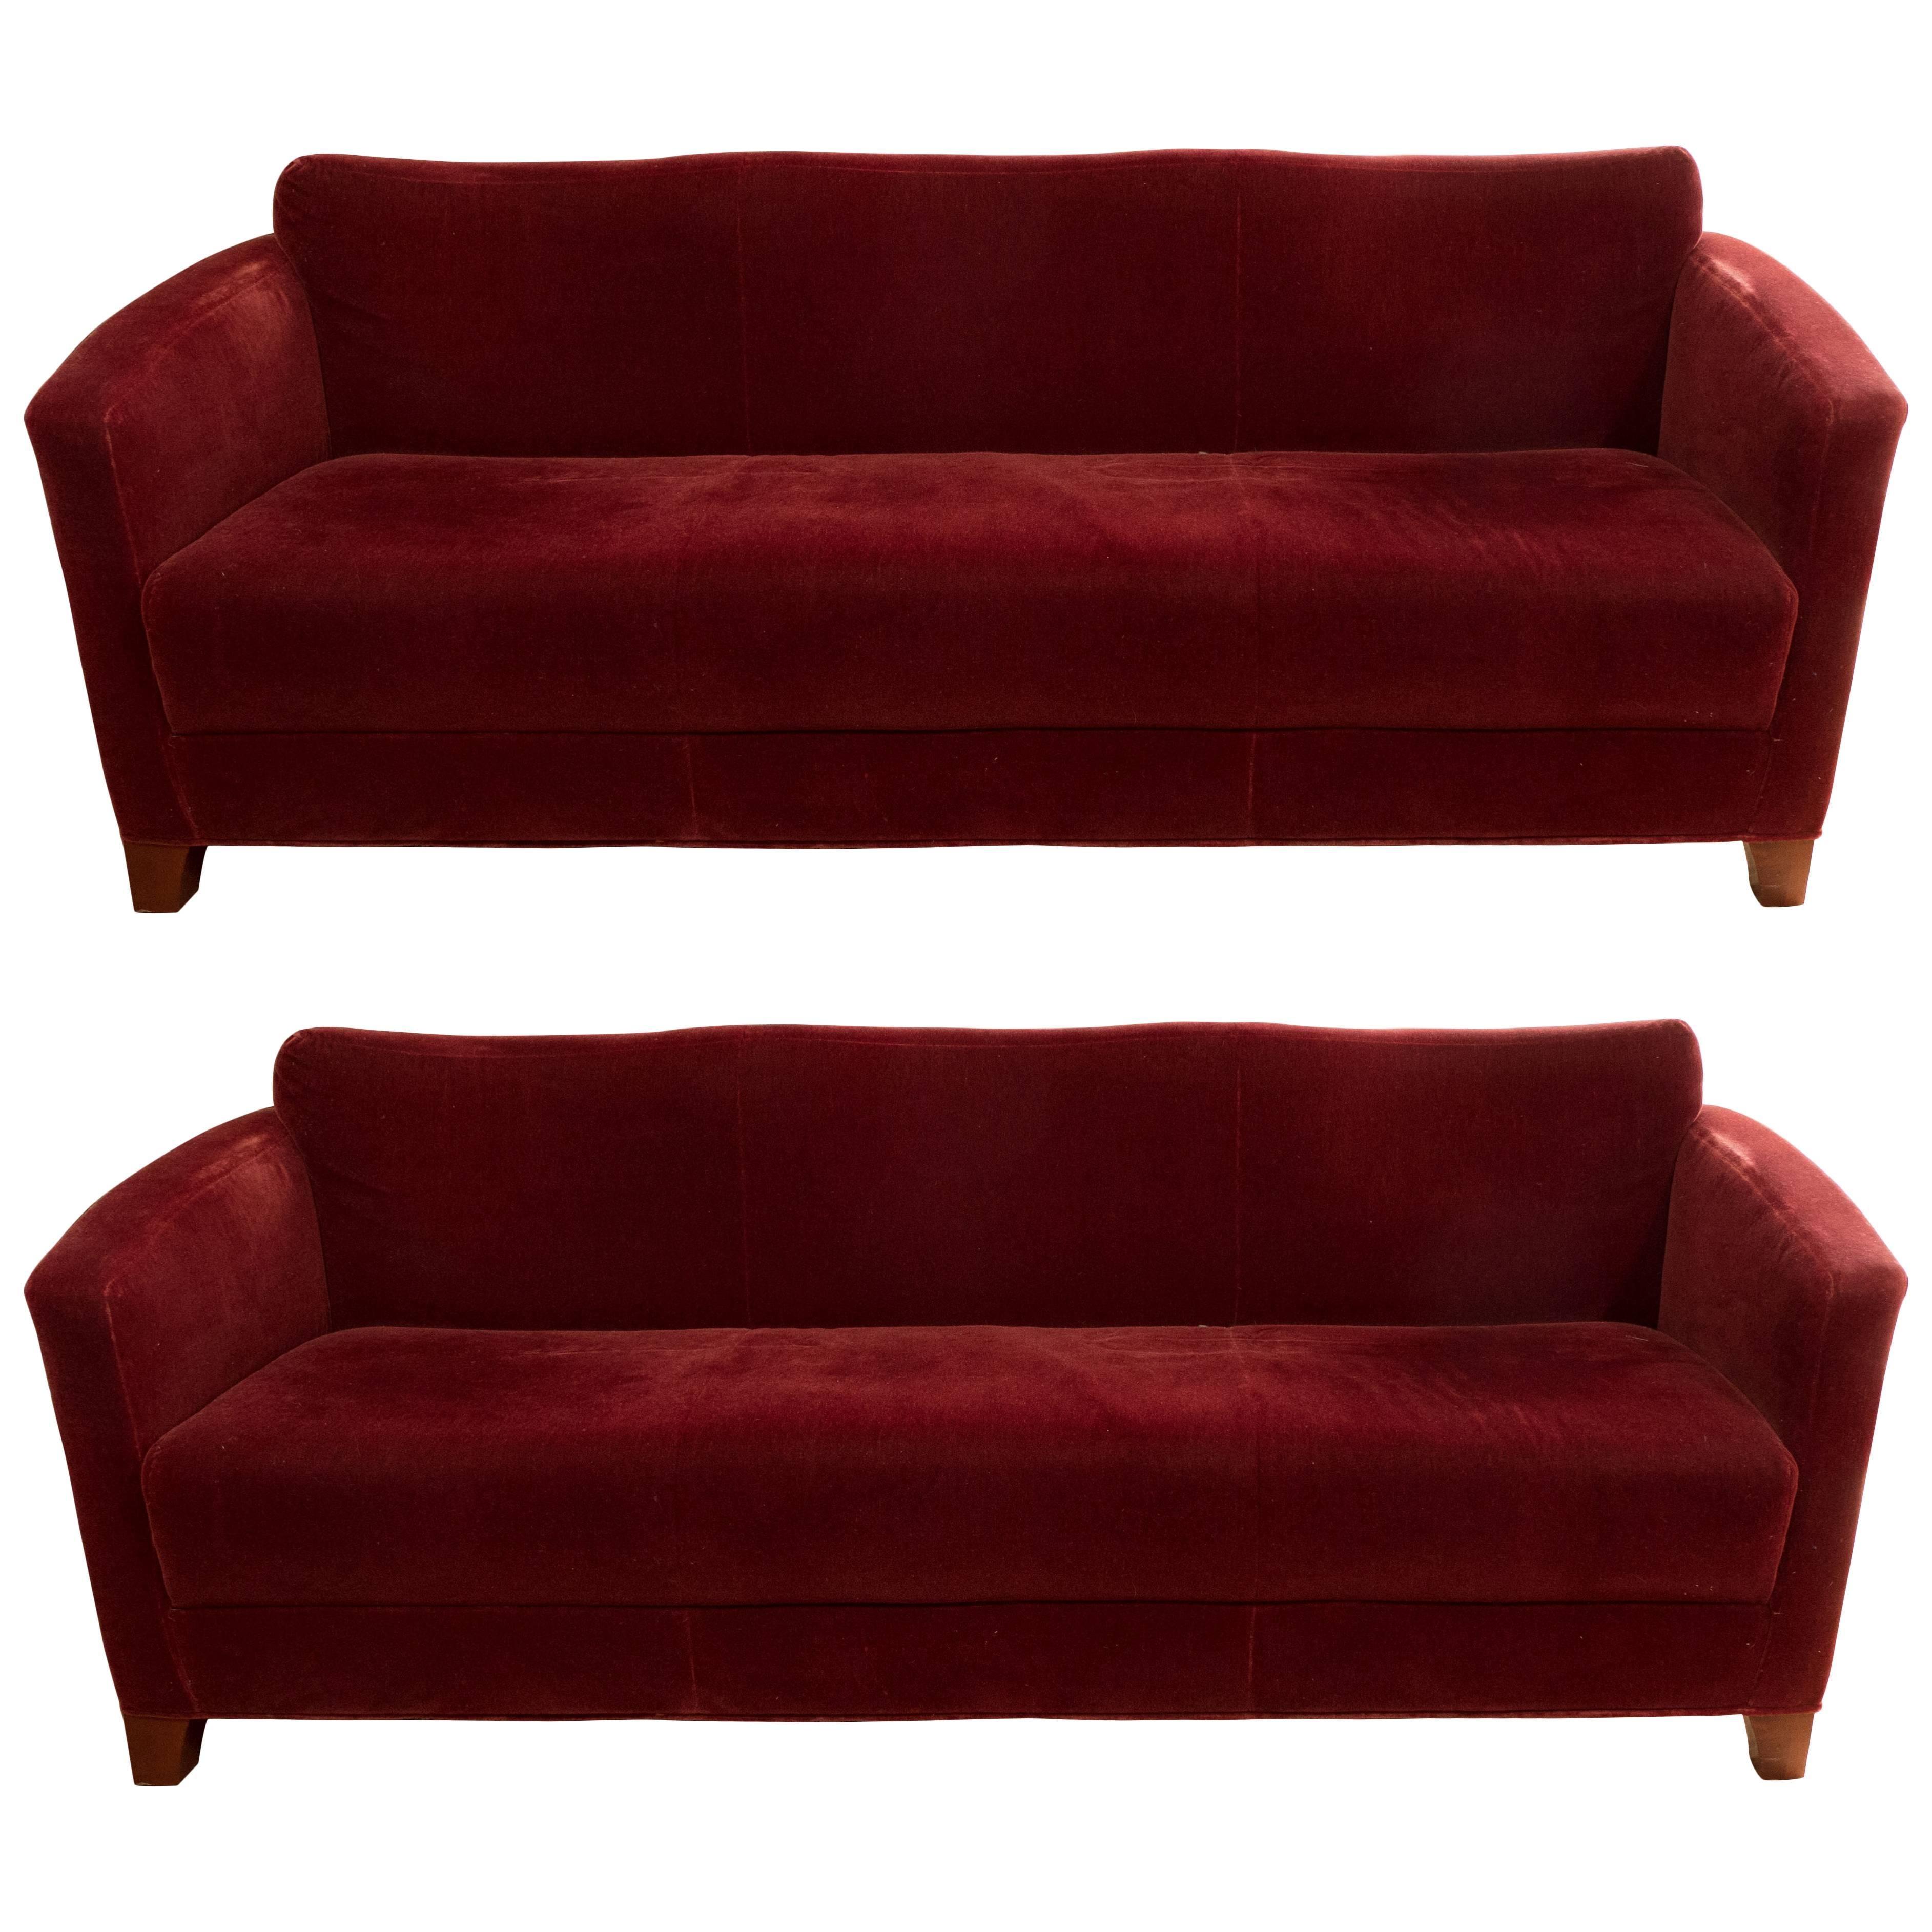 Pair Of Italian Midcentury Sofas For Sale